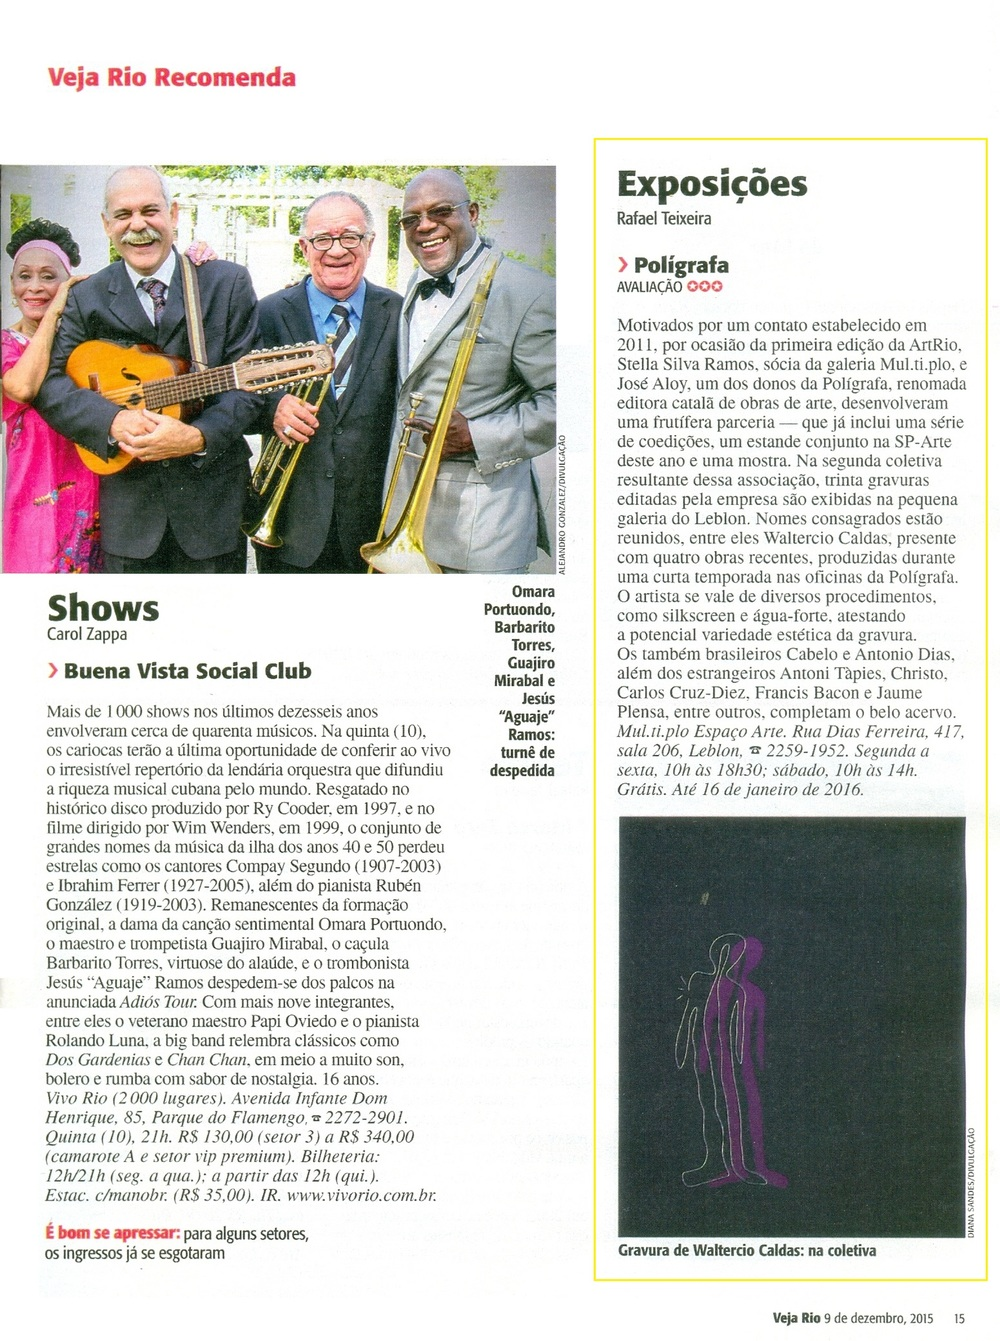 MUL.TI.PLO ESPAÇO ARTE NA REVISTA VEJA RIO 09-12 (pg.15).jpg